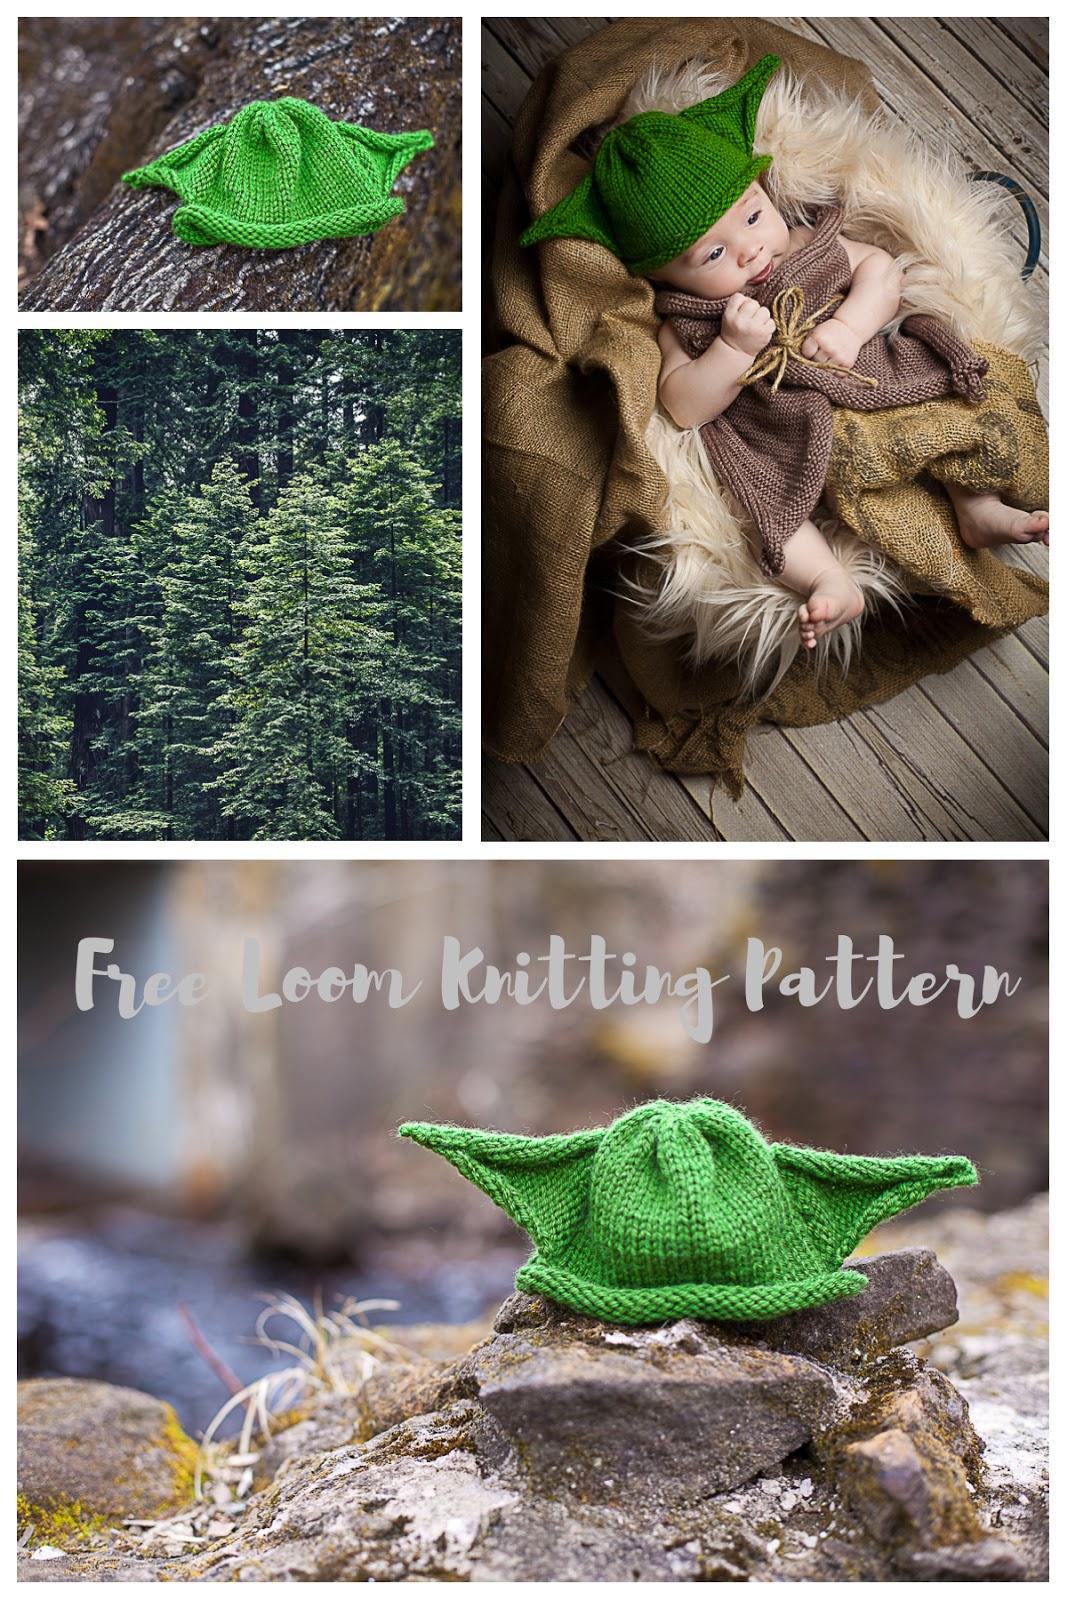 loom knit yoda hat, loom knit yoda robe, baby robe, baby hat, loom knit, star wars, yoda, loom knit robe, loom knit jedi set, loom knit jedi robe, jedi, free loom knitting patterns, loom knit